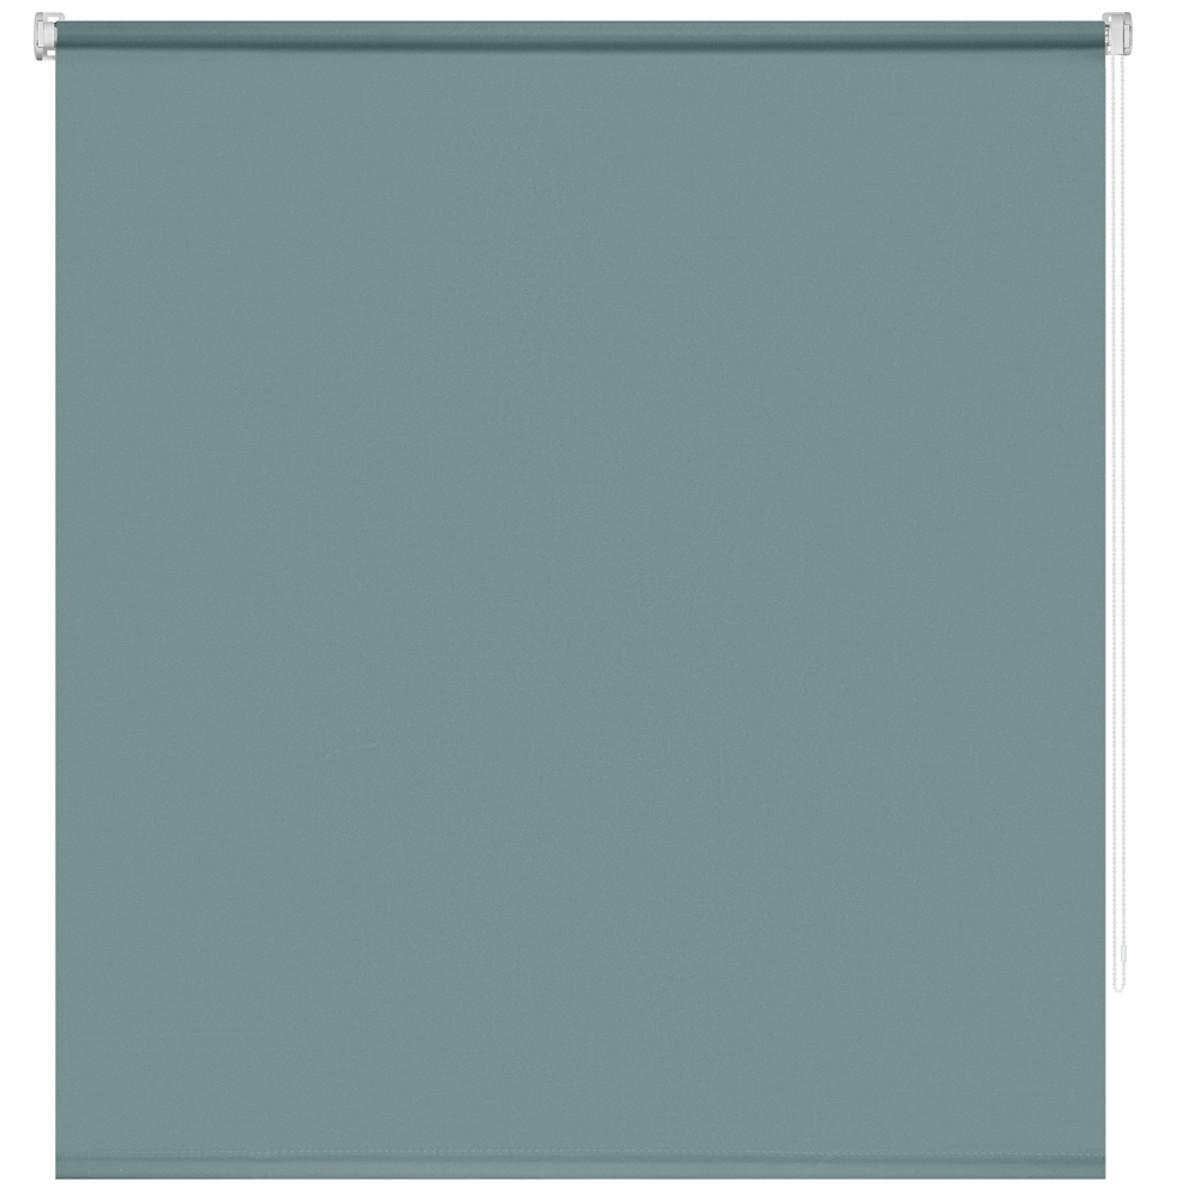 Рулонная Ора Decofest Плайн 100Х160 Цвет Бирюзовый